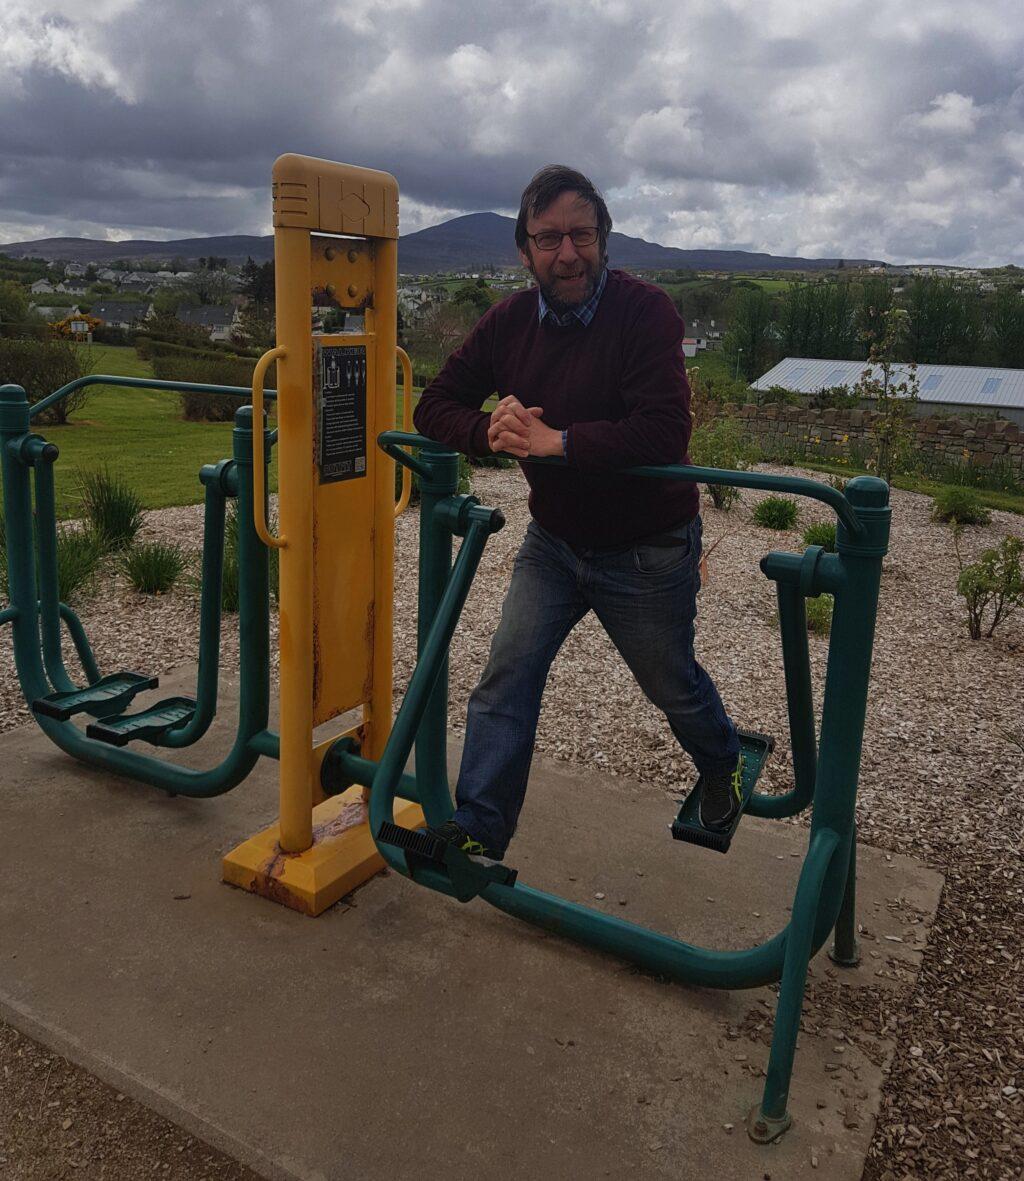 Cllr Albert Doherty doing a spot of exercise at Carn's award-winning Barrack Hill Park.